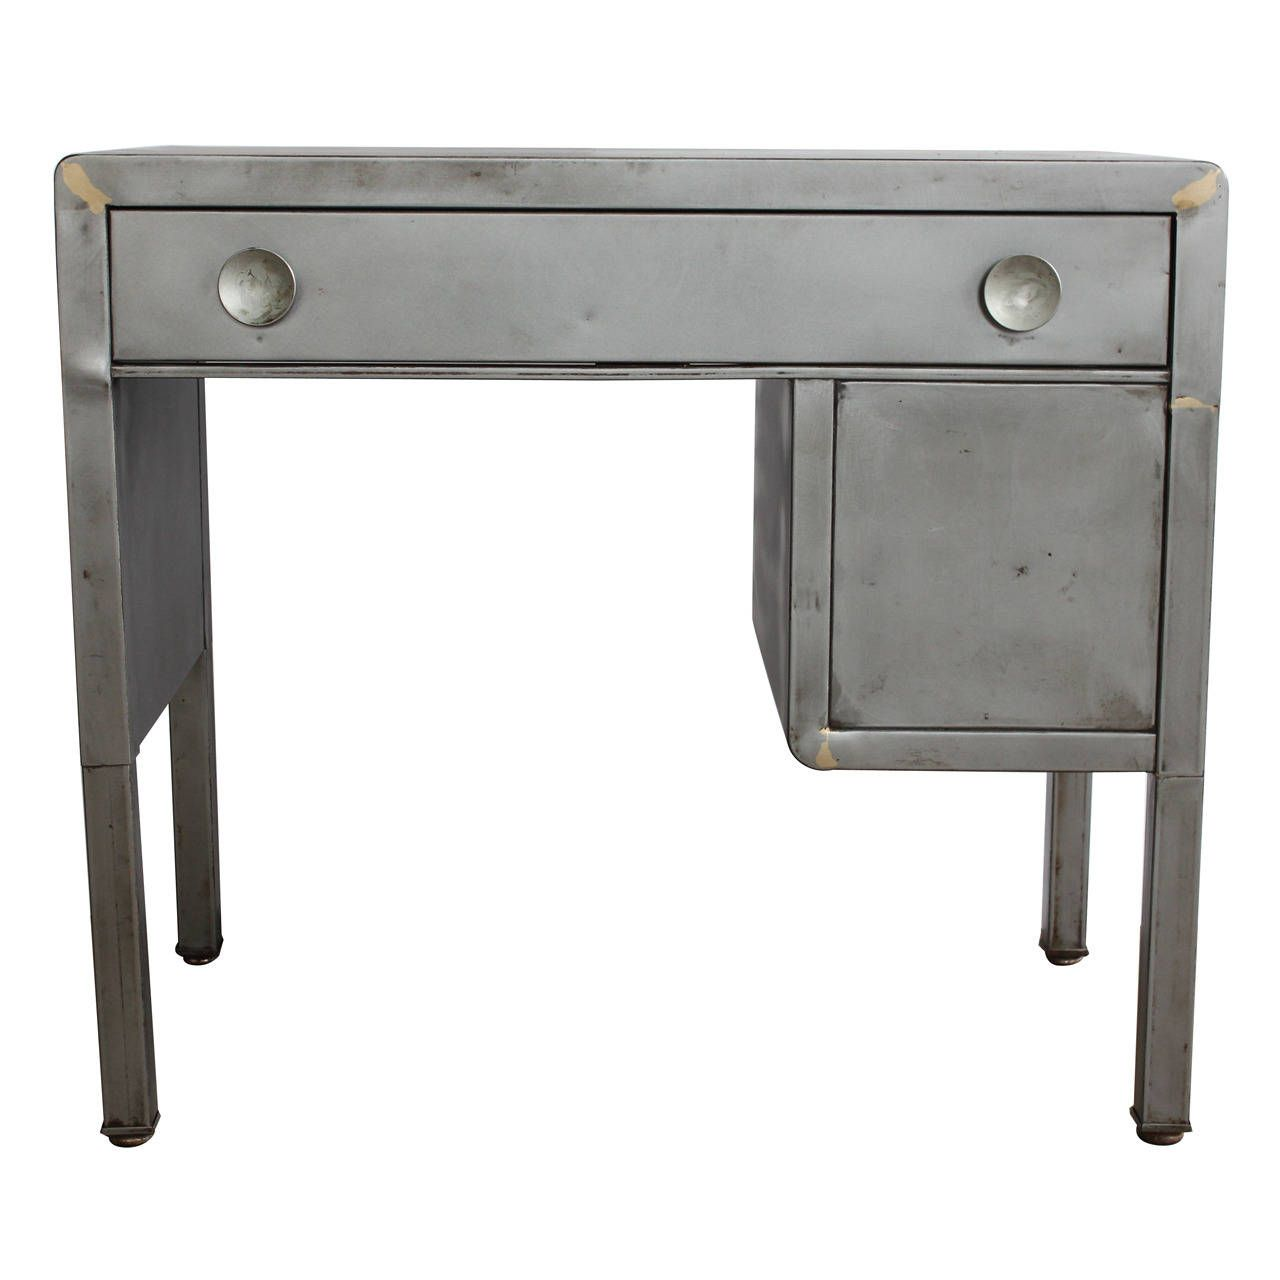 Vintage Industrial Metal Desk by Norman Bel Geddes - Vintage Industrial Metal Desk By Norman Bel Geddes Metal Desks